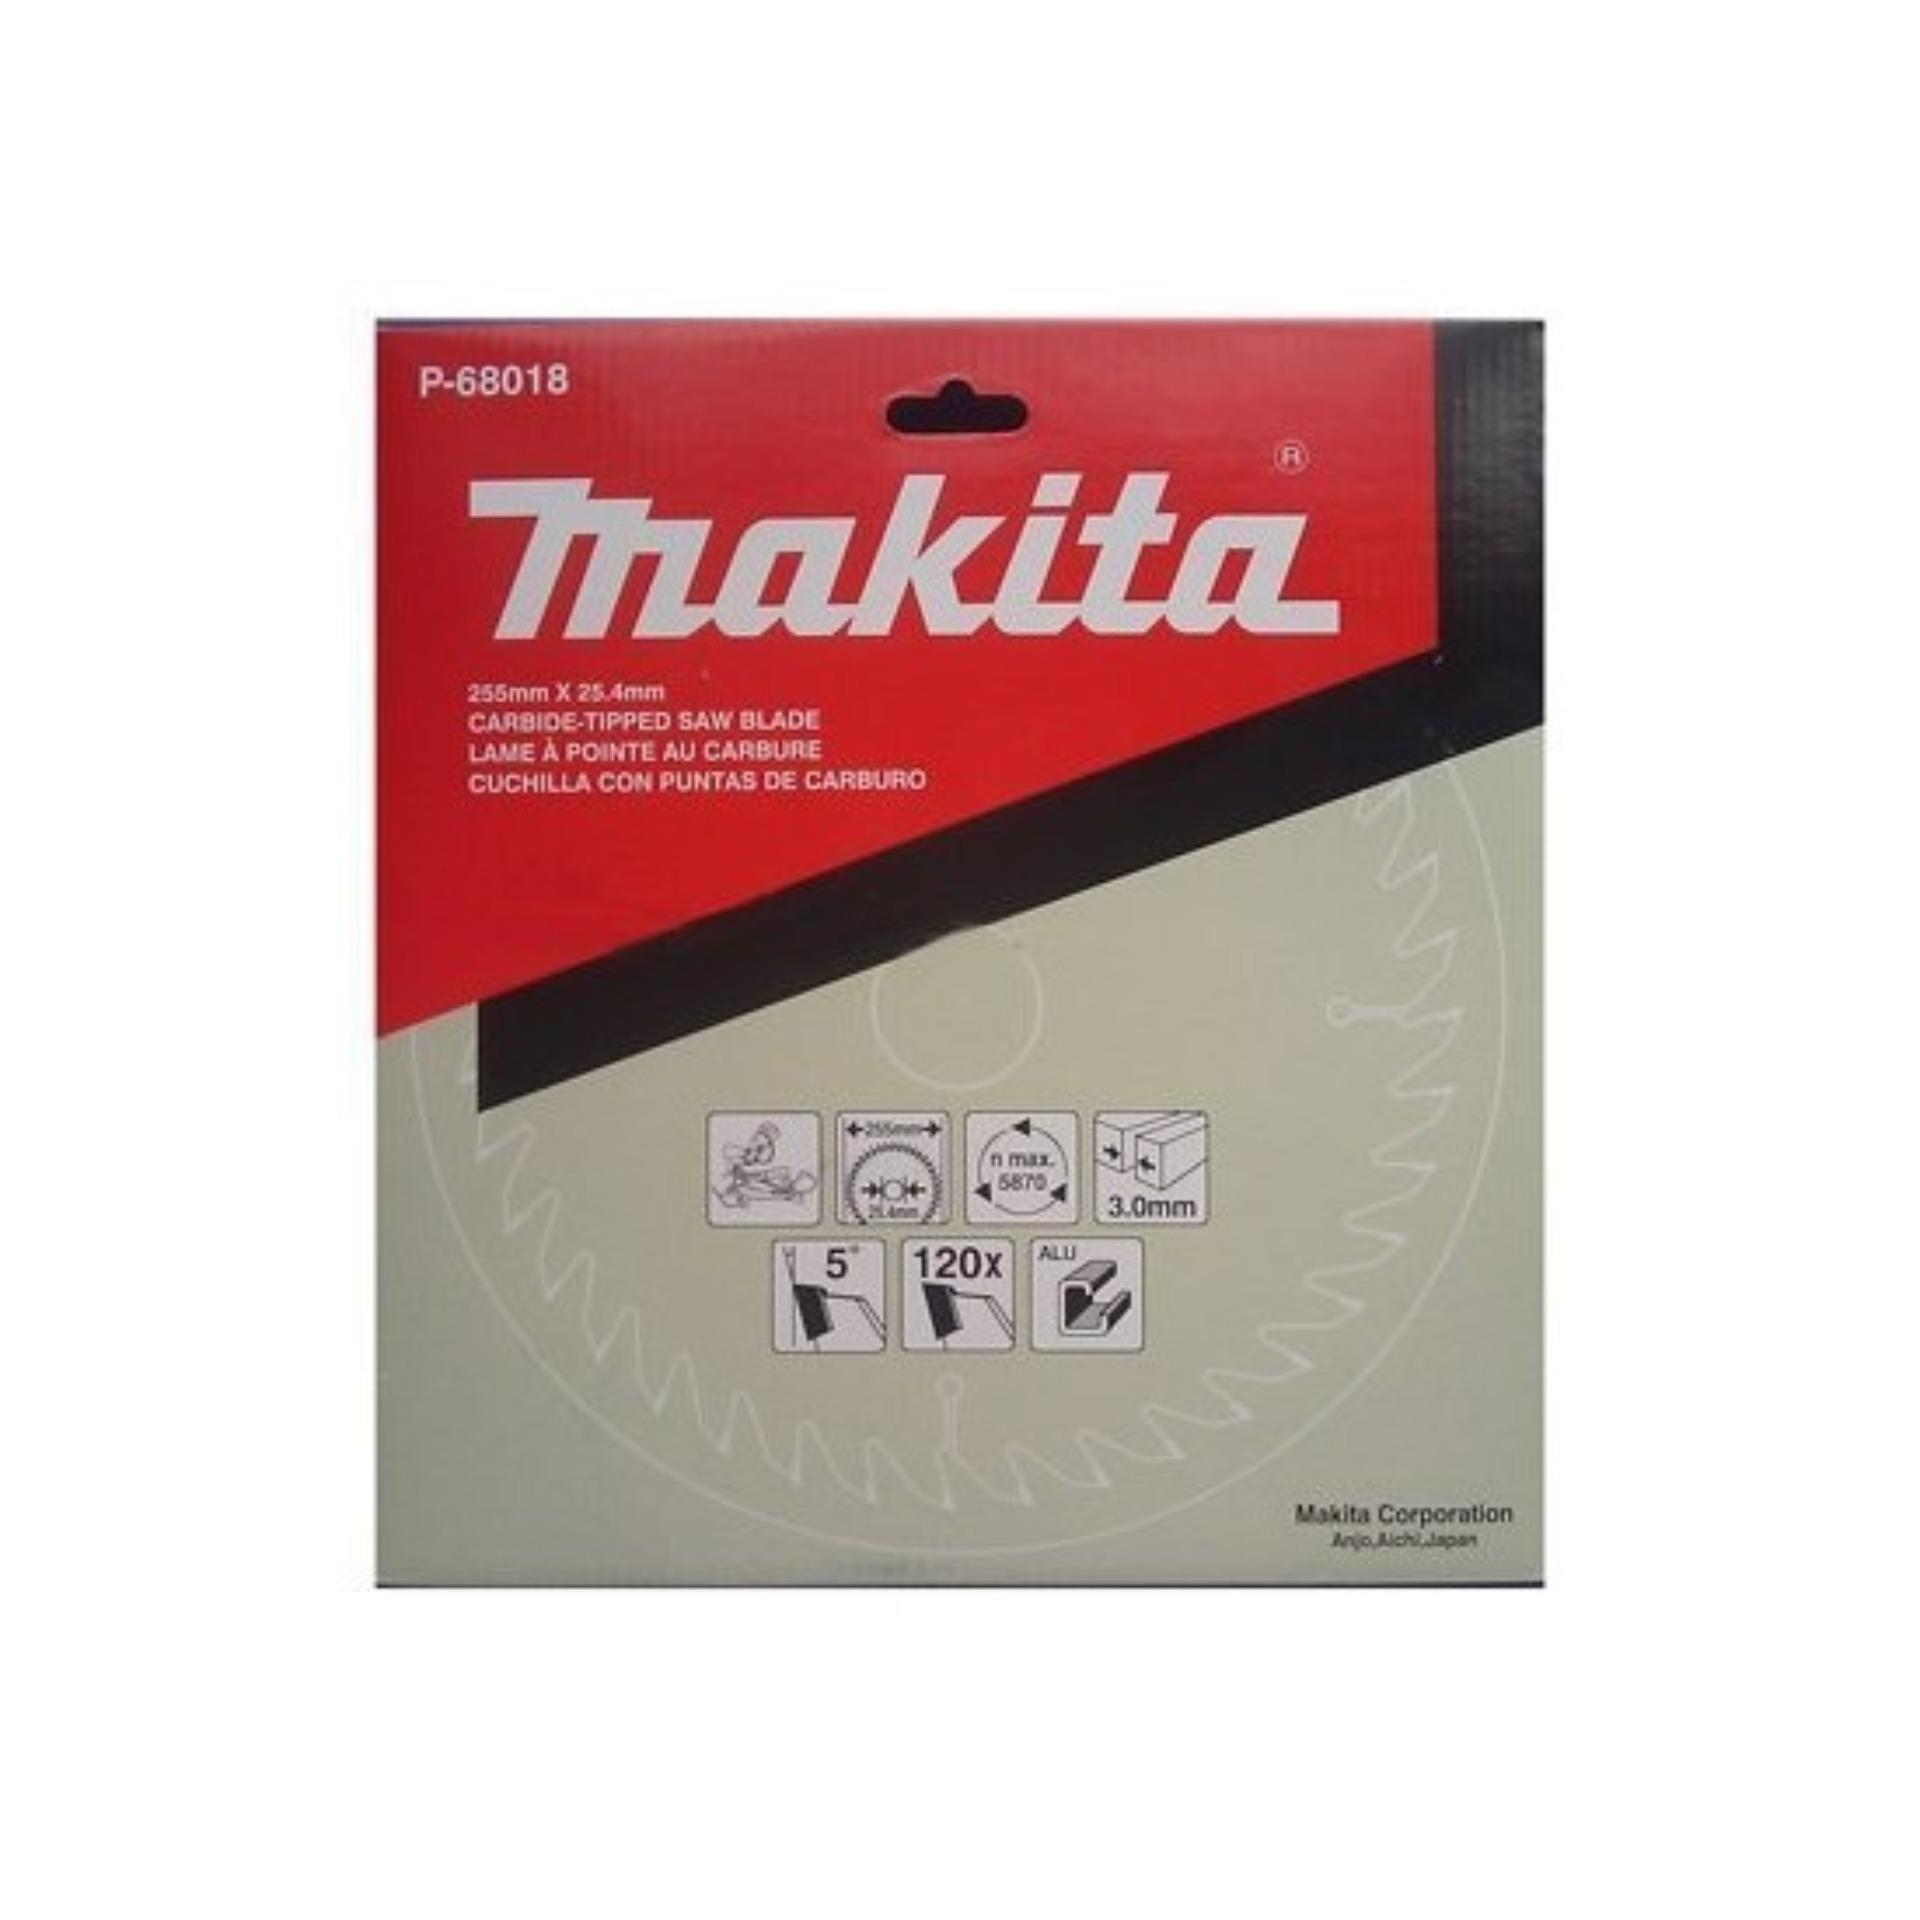 Lưỡi Cắt Nhôm 120T Makita P-68018